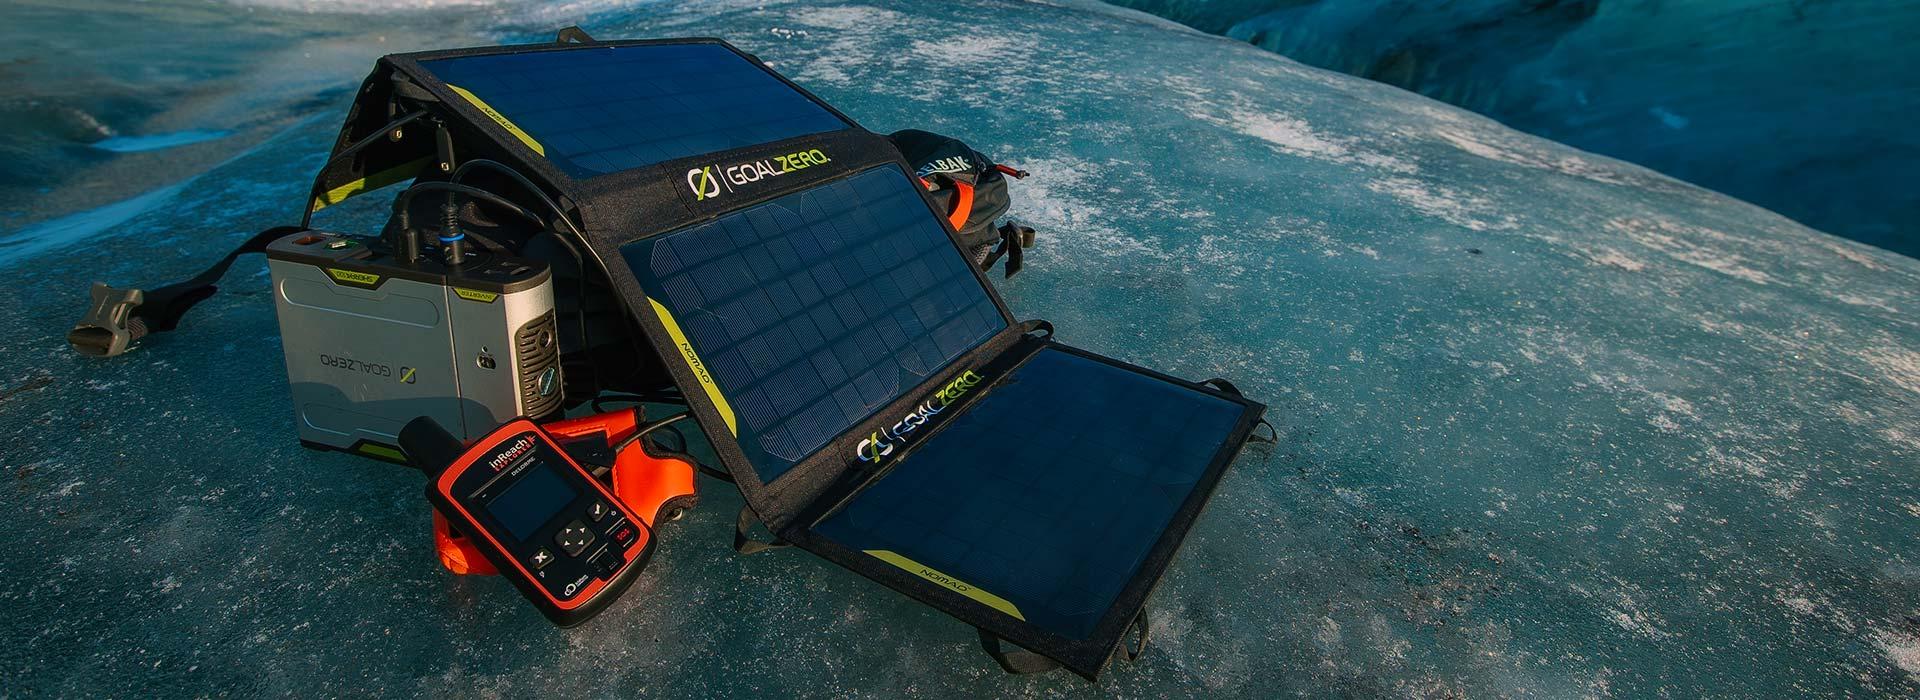 Goal Zero - Portable Solar Panels